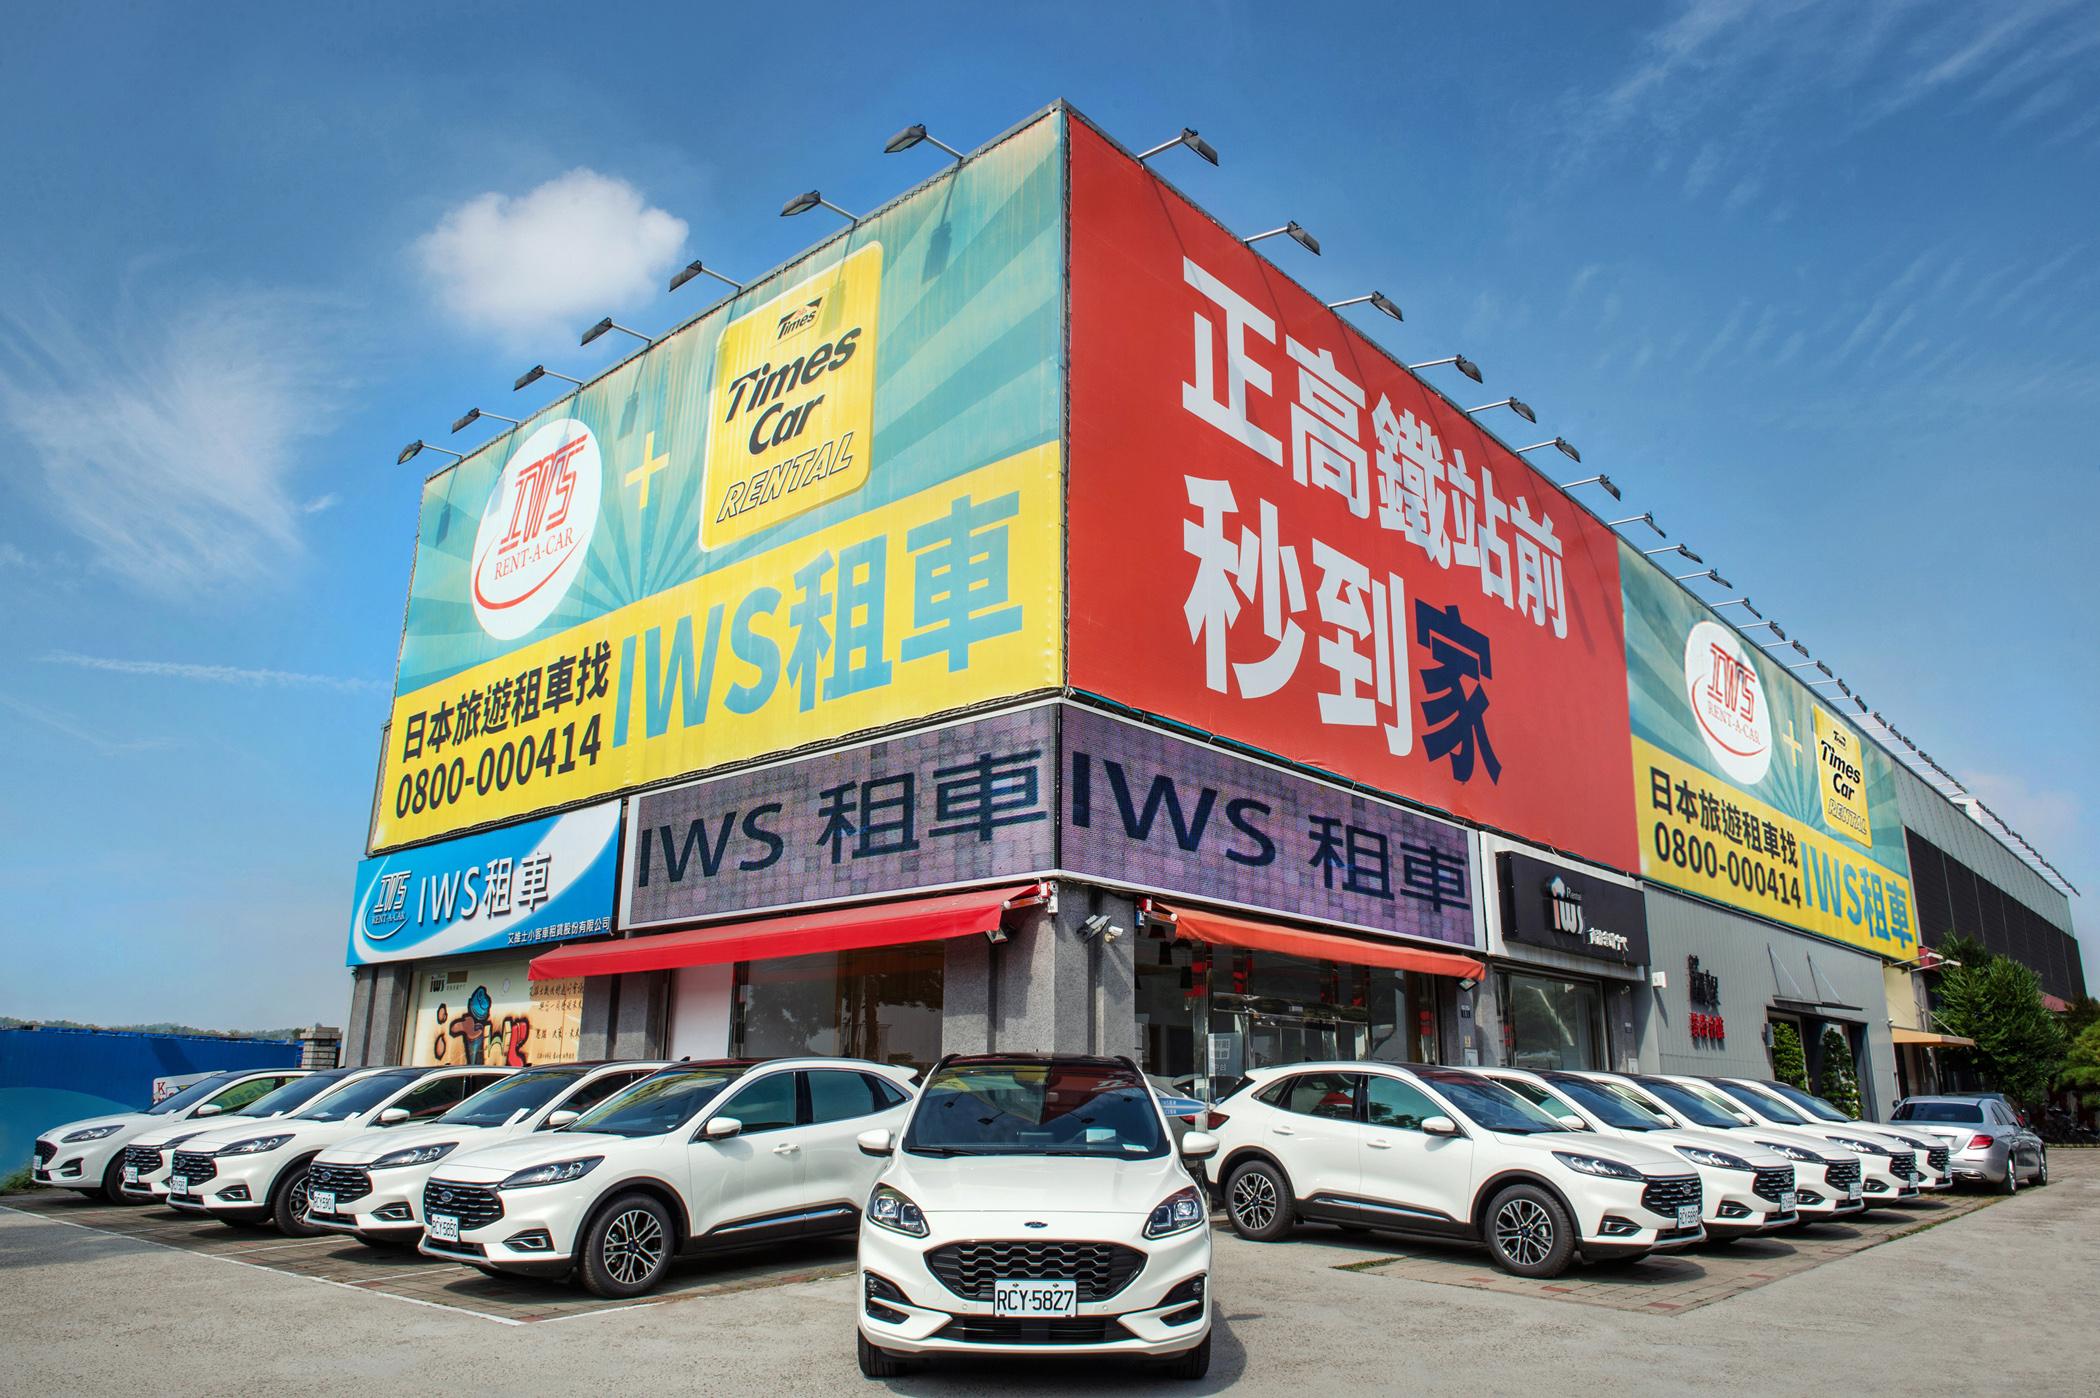 IWS 租車自即日起推出「The All-New Ford Kuga全方位智駕暢行專案」,單日最低 3,250 元起優惠租金。